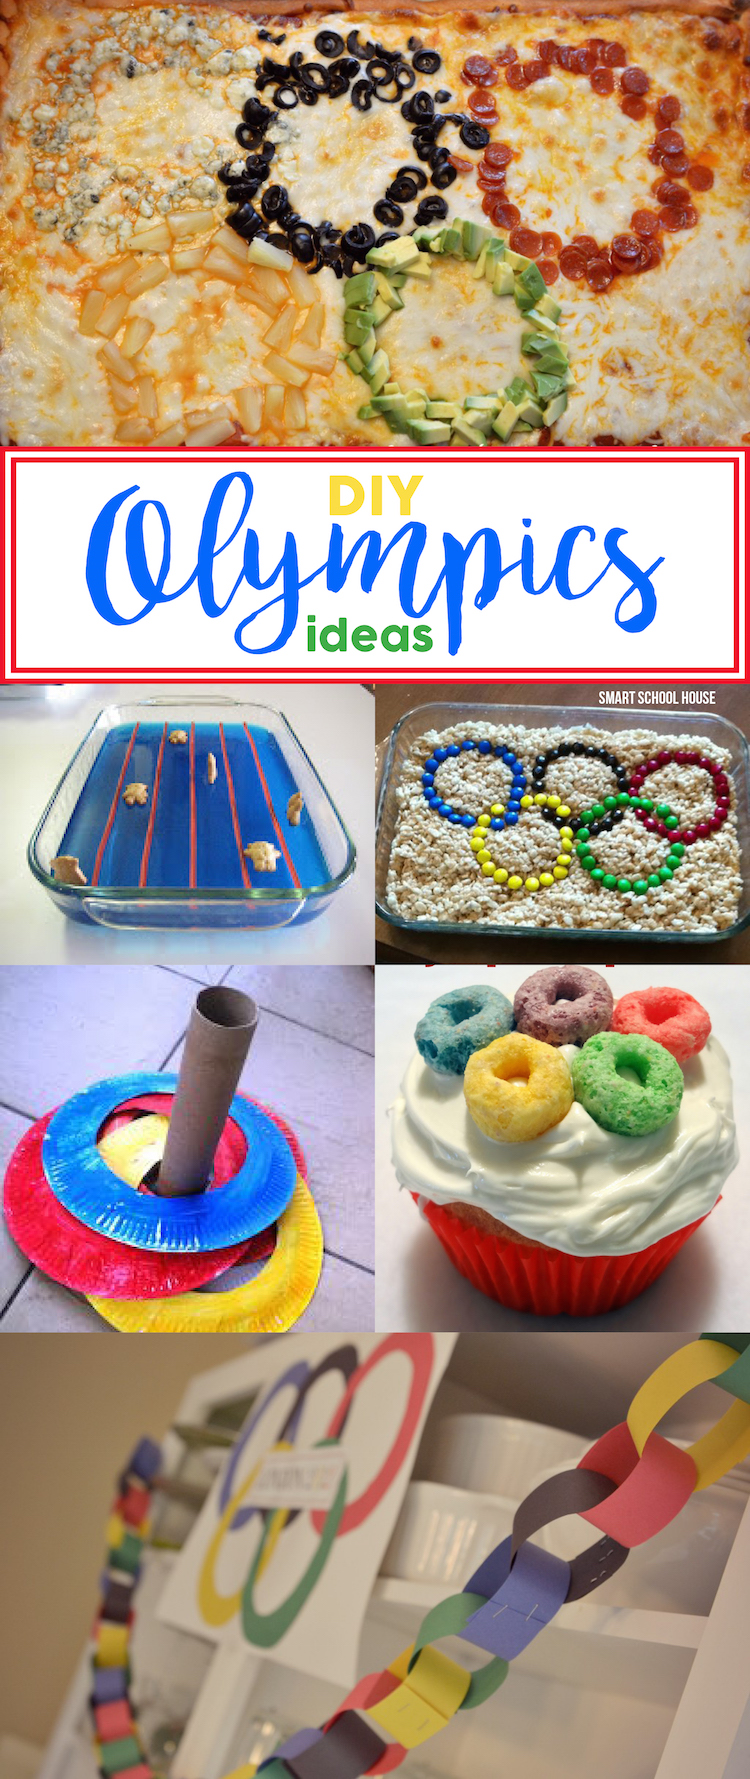 DIY Olympics ideas